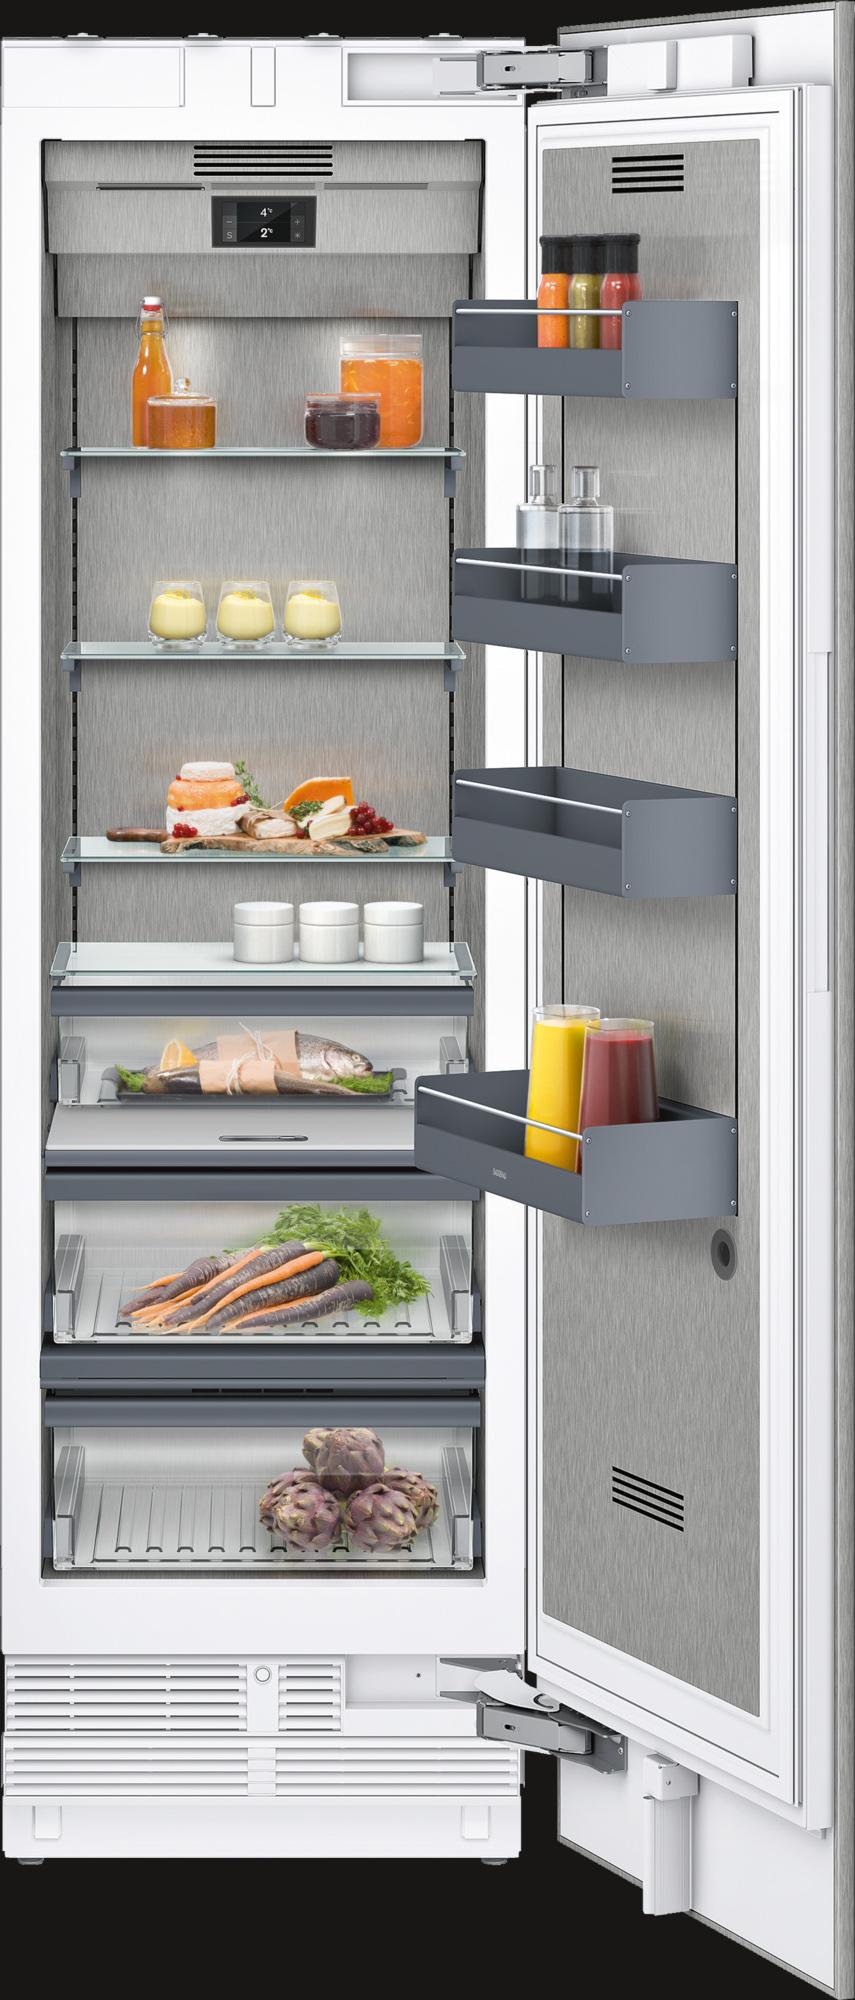 Холодильник GAGGENAU Vario серії 400 RC462304